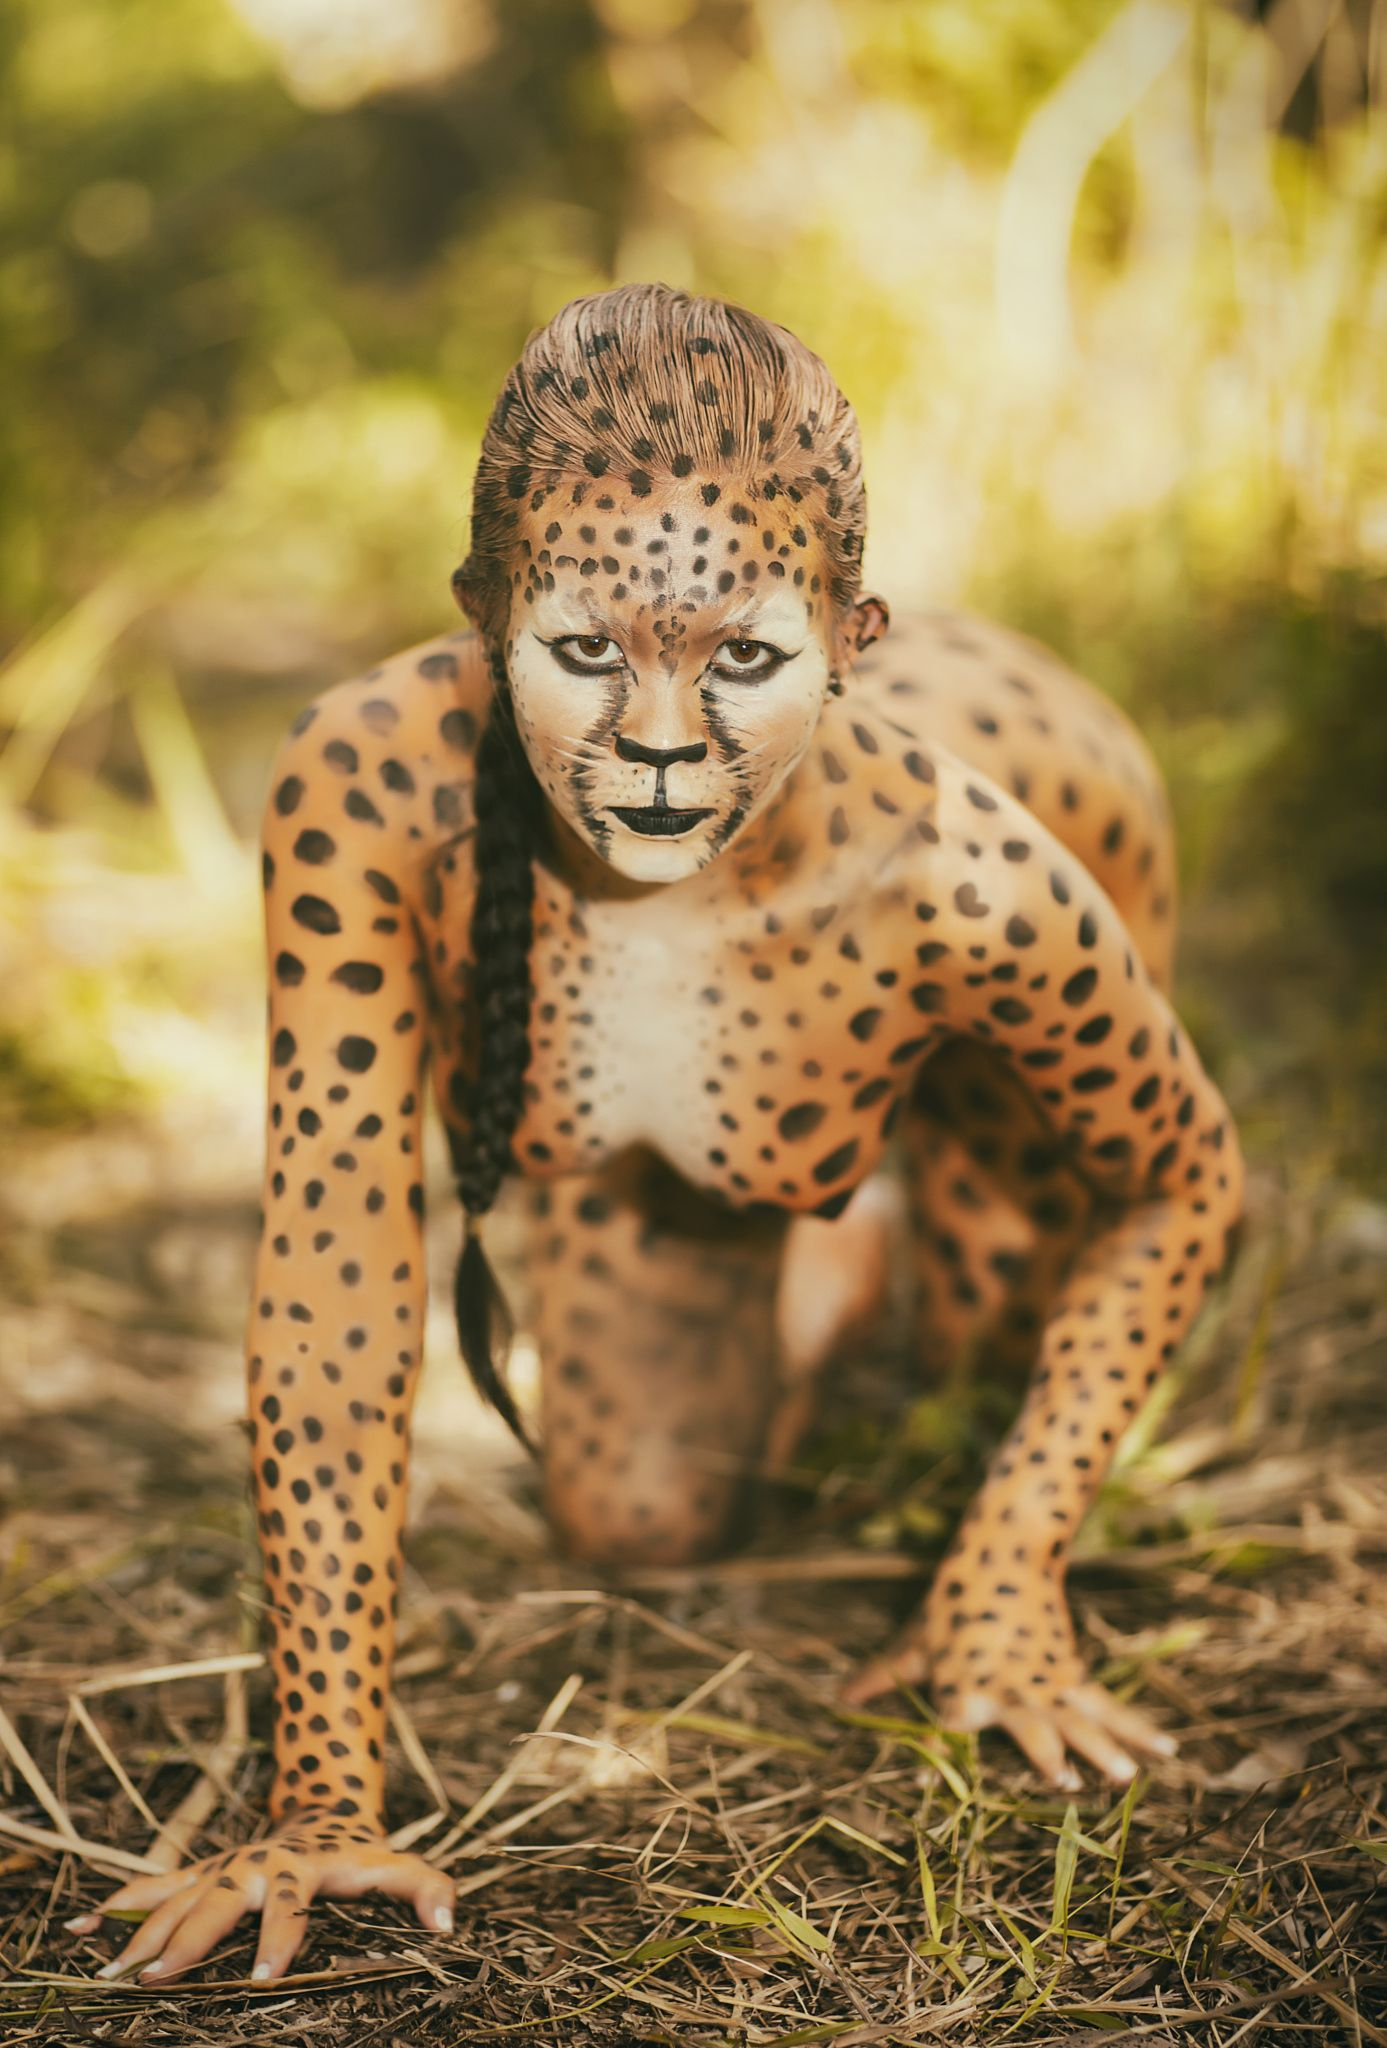 Paint null inspirational photos. Cheetah clipart body